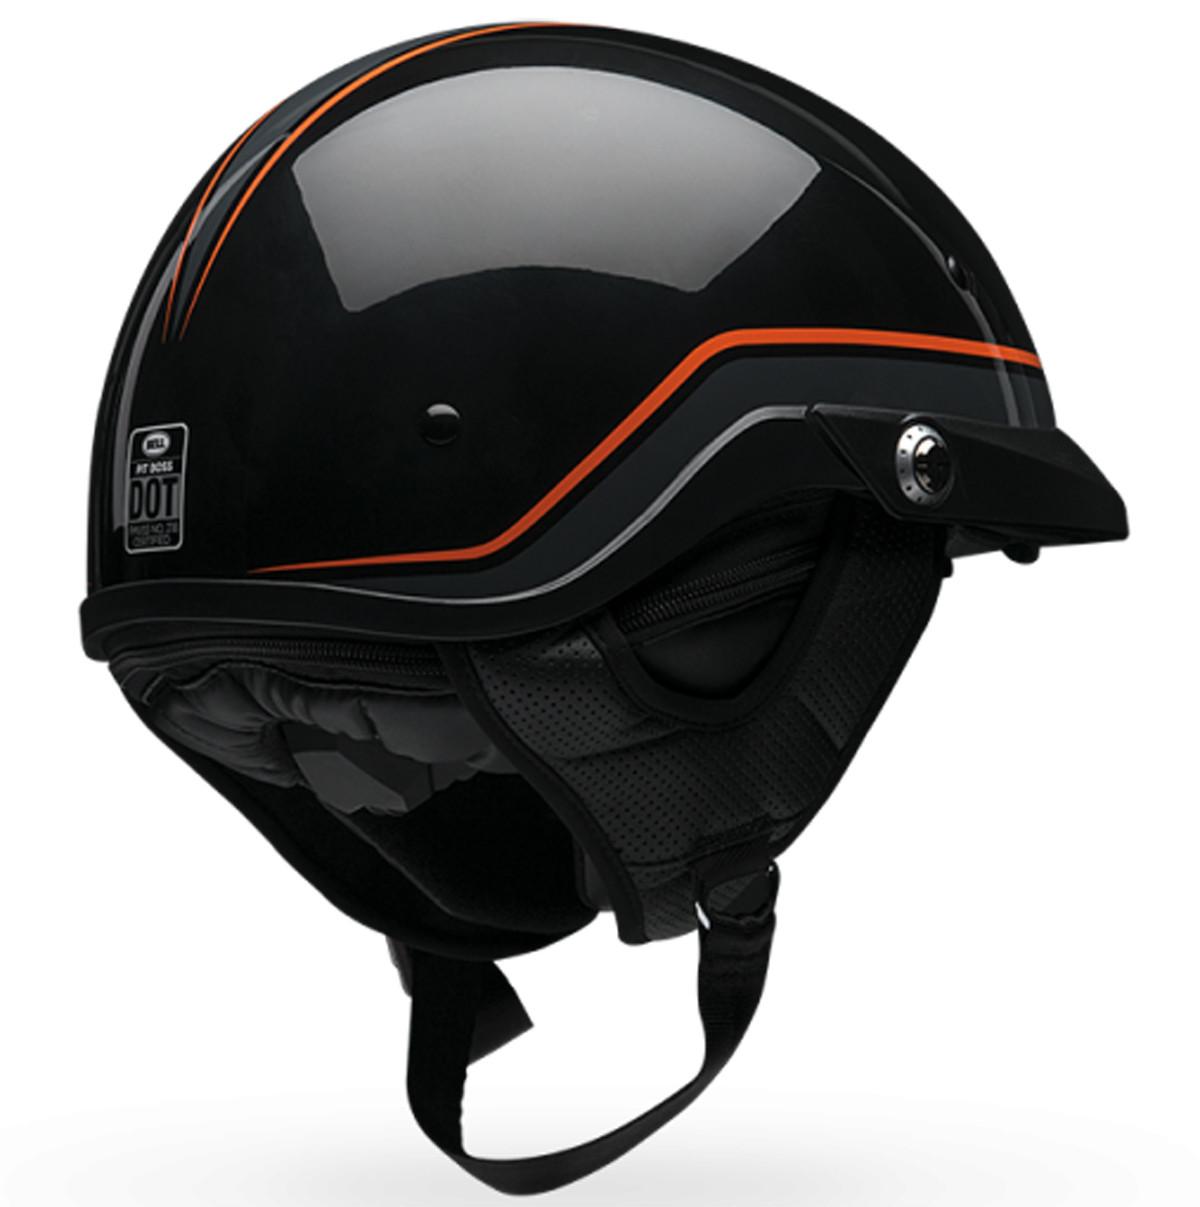 Bell Dual Sport Helmet >> Bell Pit Boss Pin Half Helmet | XtremeHelmets.com